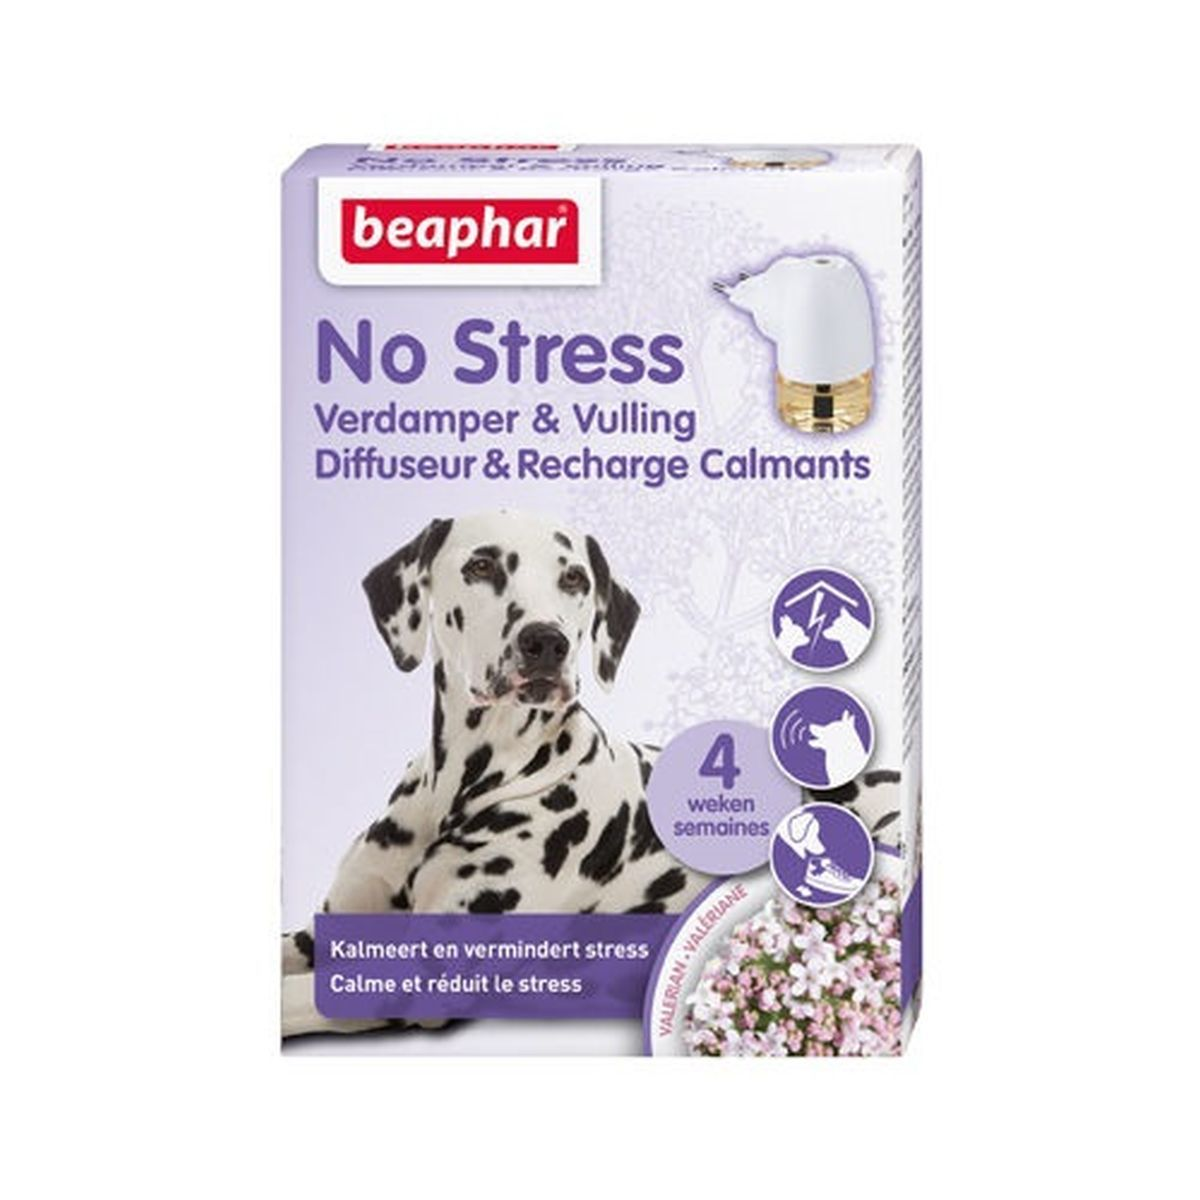 BEA NO STRESS HOND VERDAM+VUL. 00001